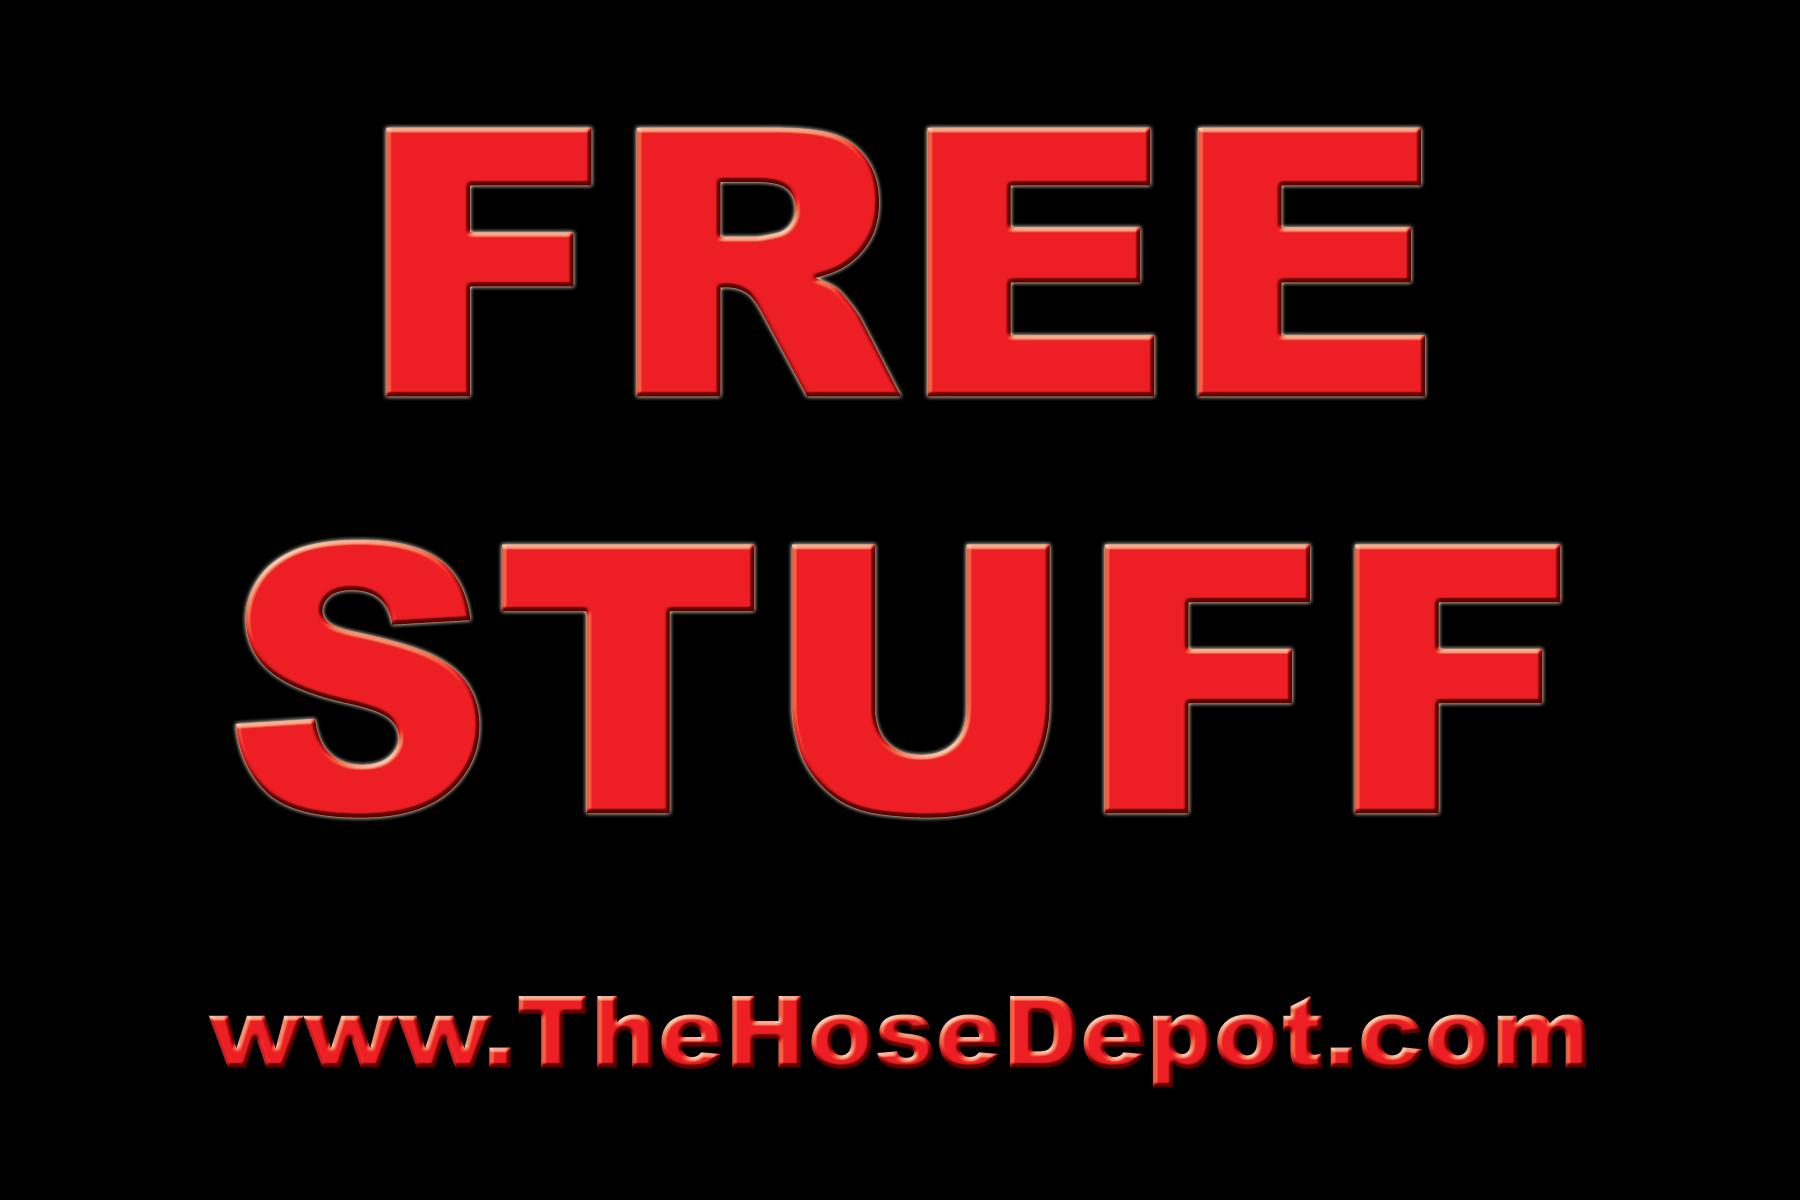 FreeStuffTheHoseDepot